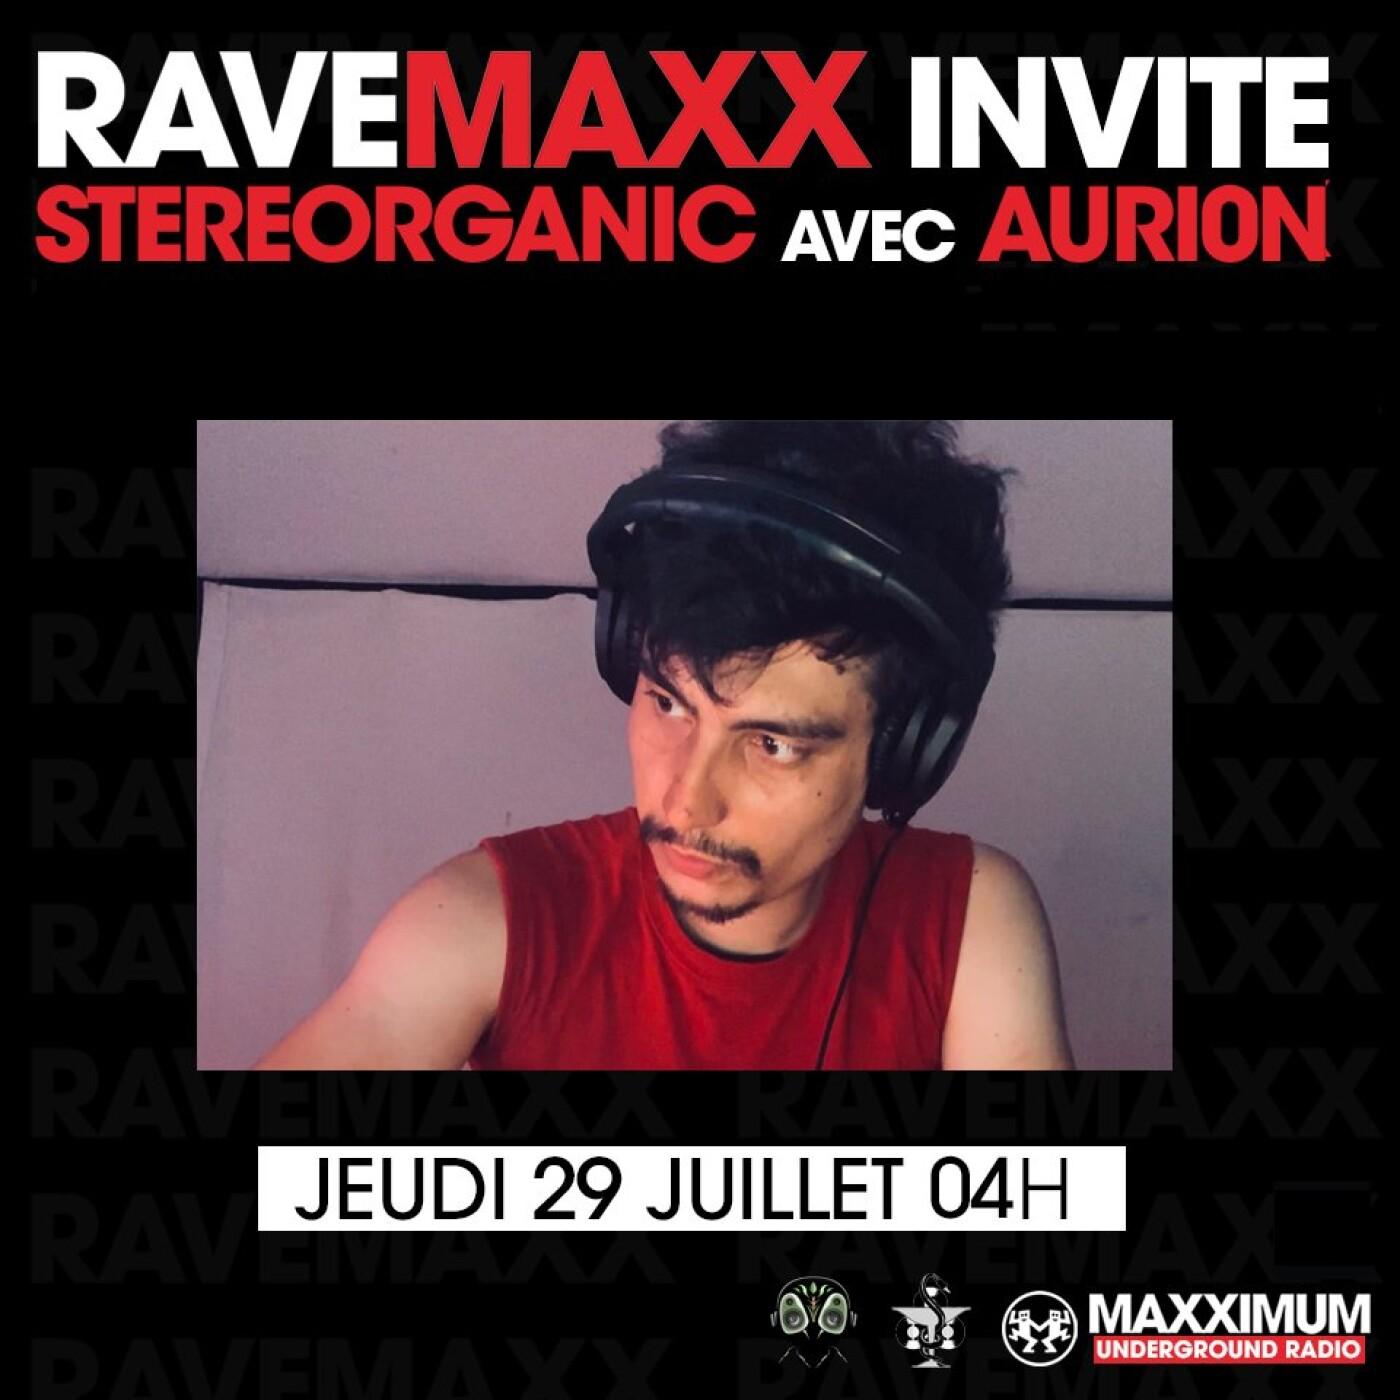 RAVEMAXX : AURION